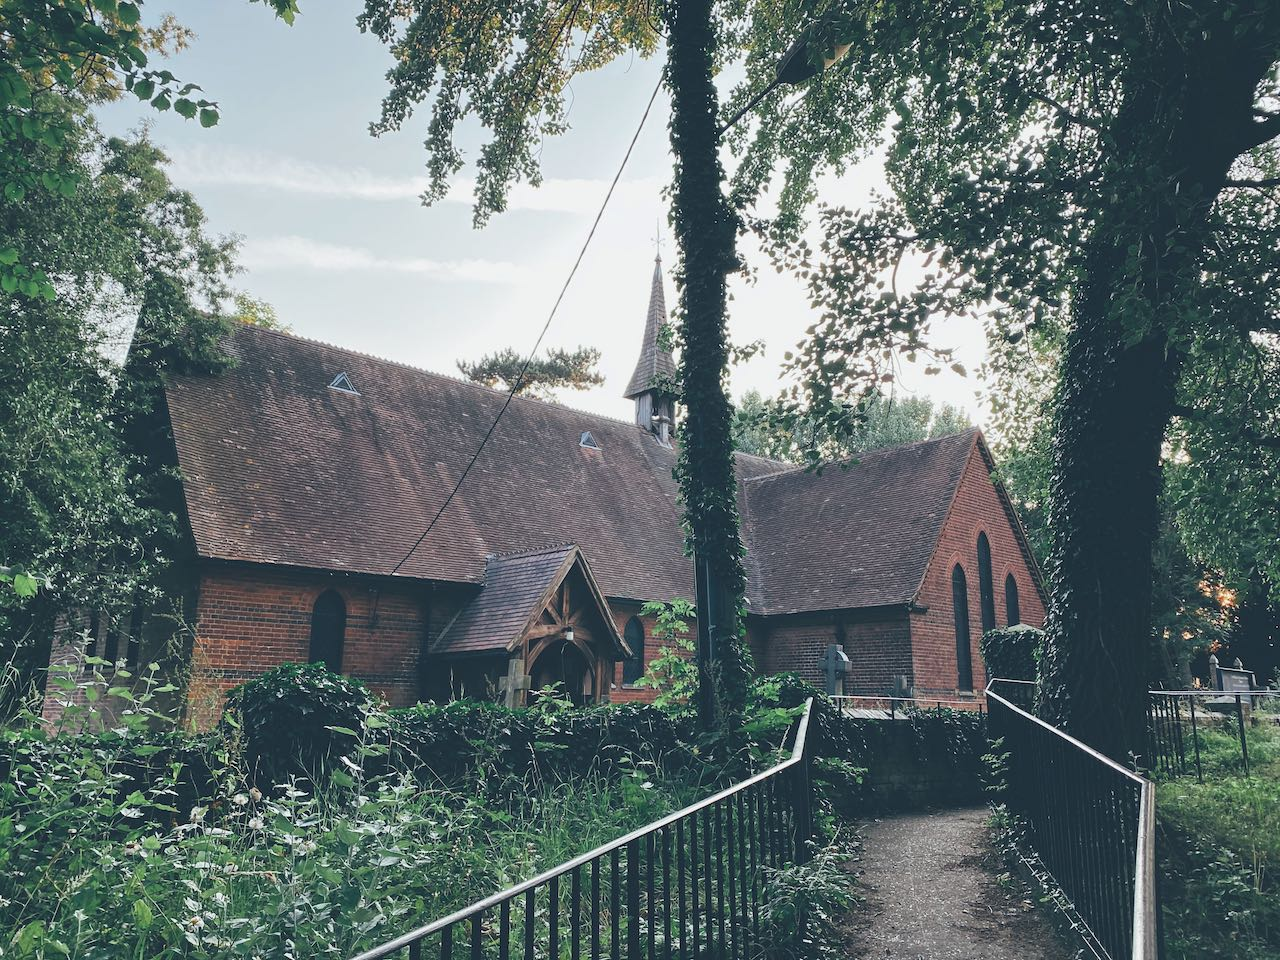 Upnor Church